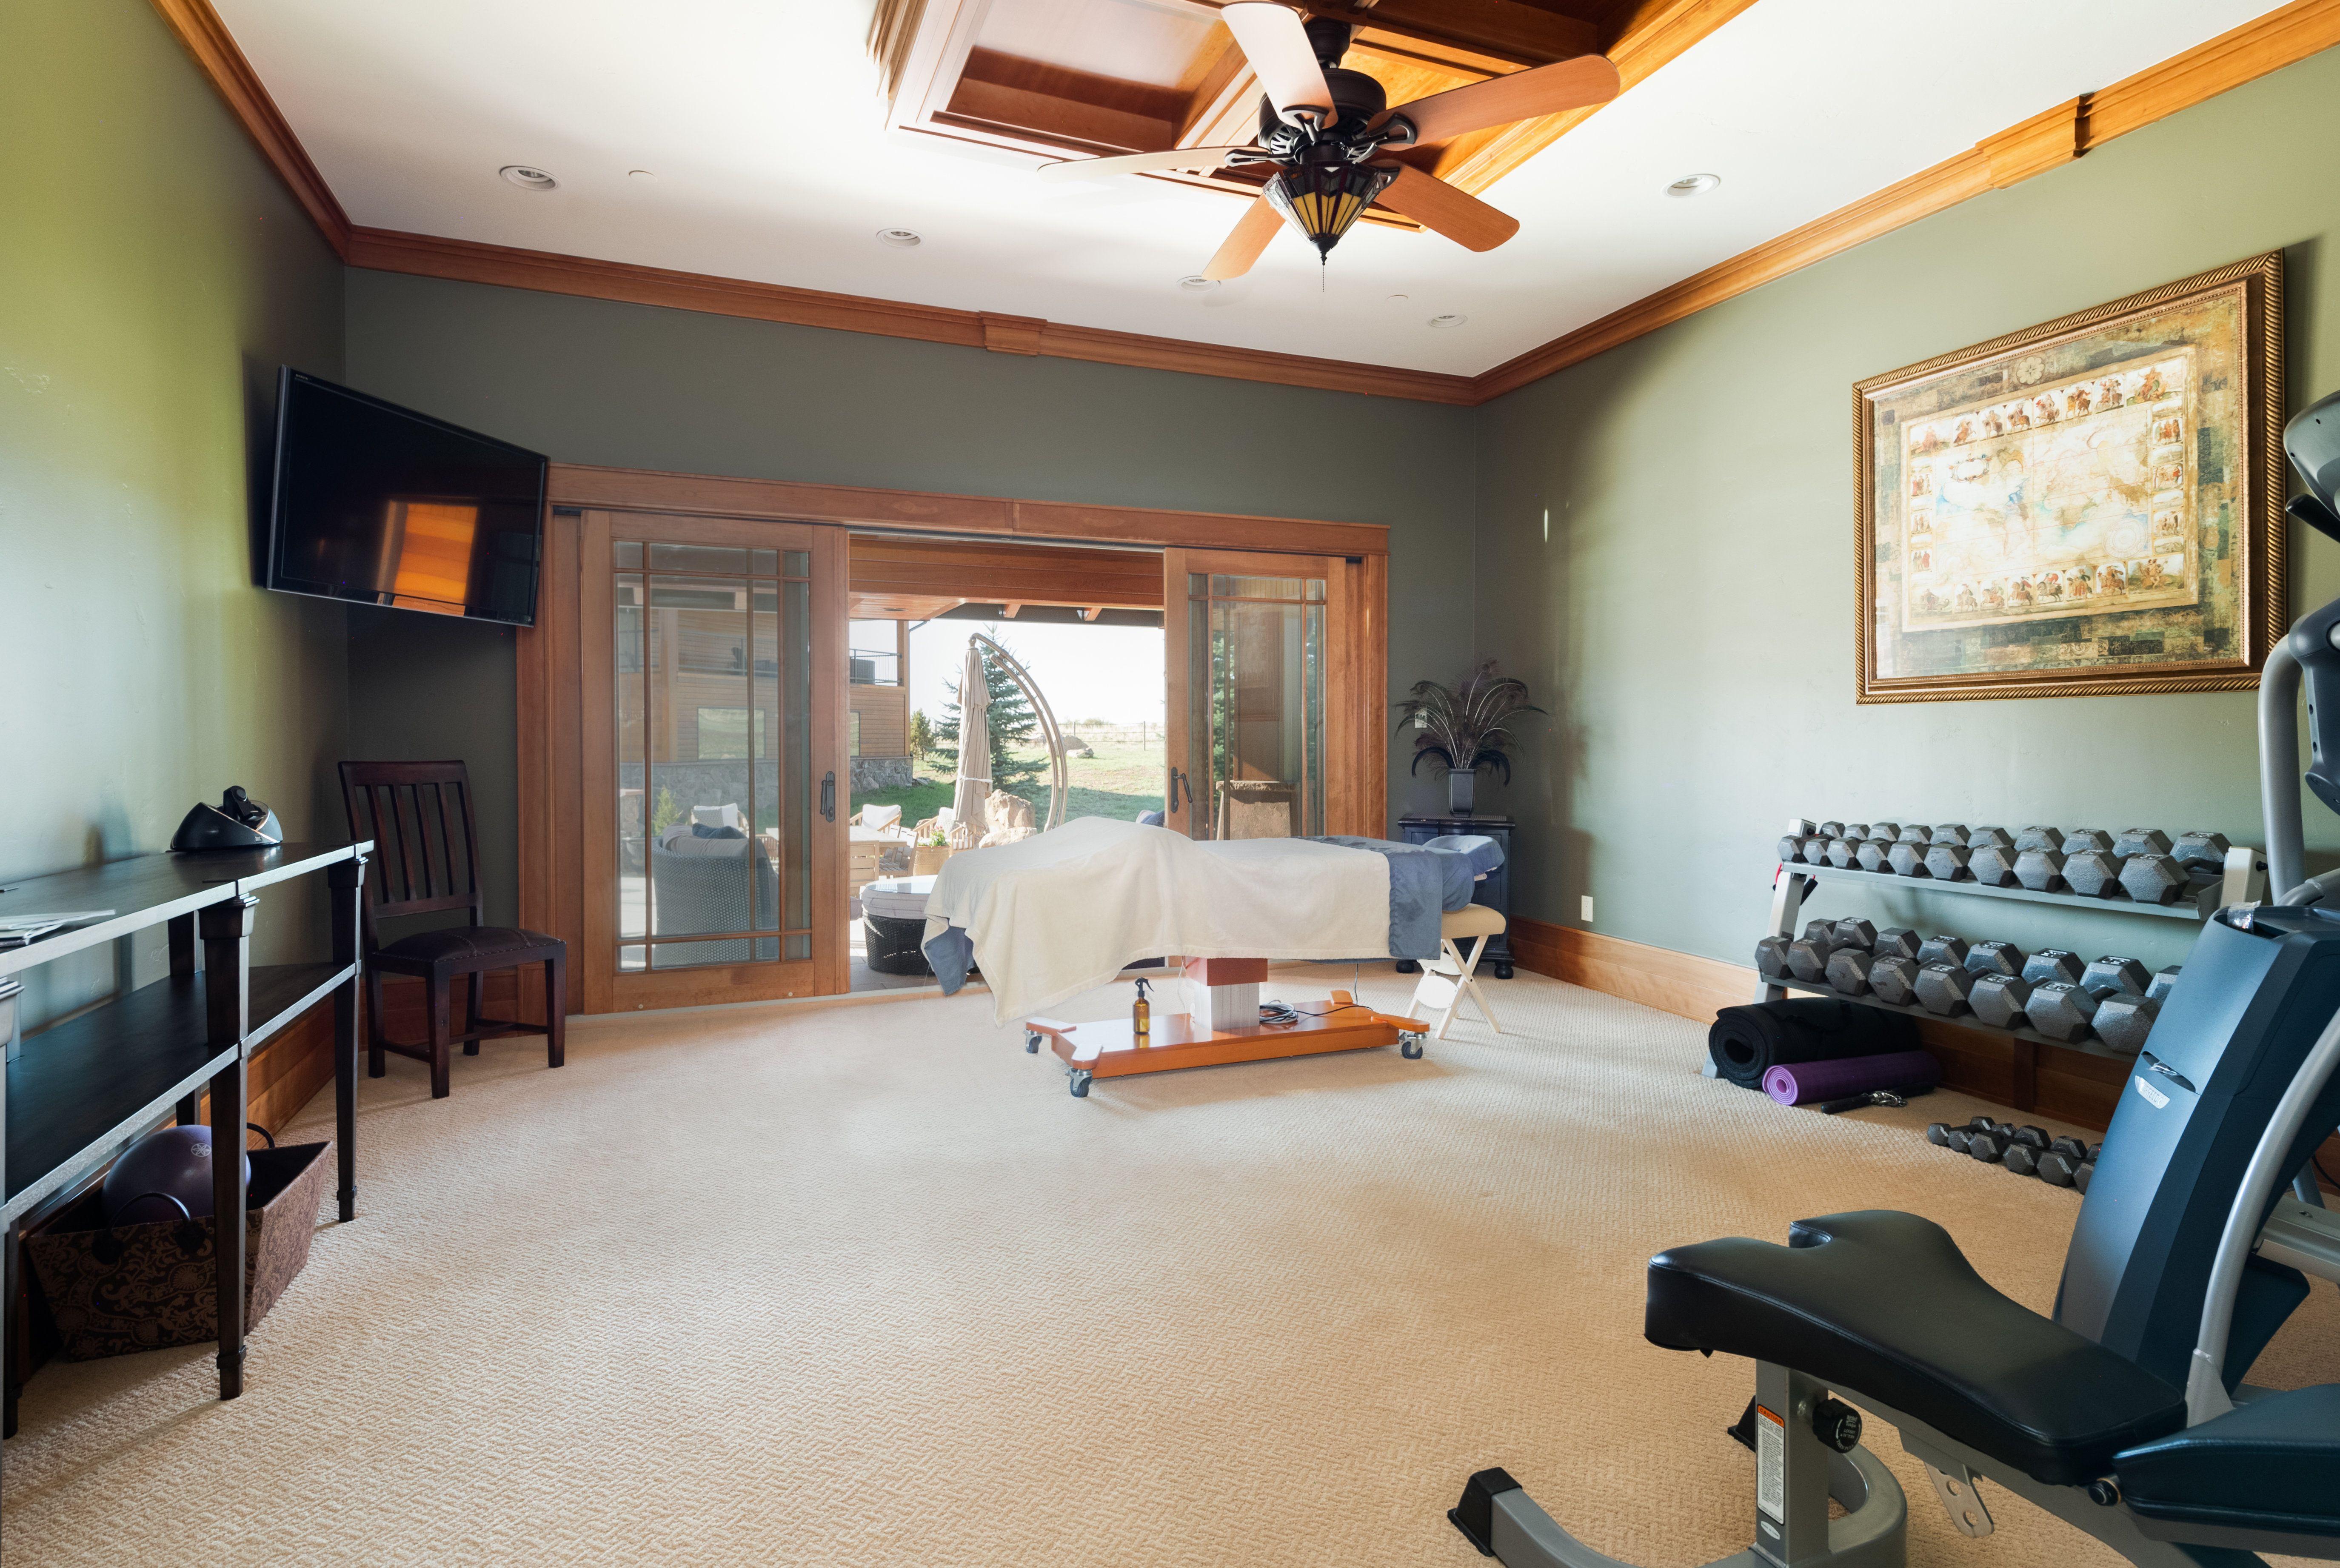 Colorado Mountain house on 35 acres asks $7M gym